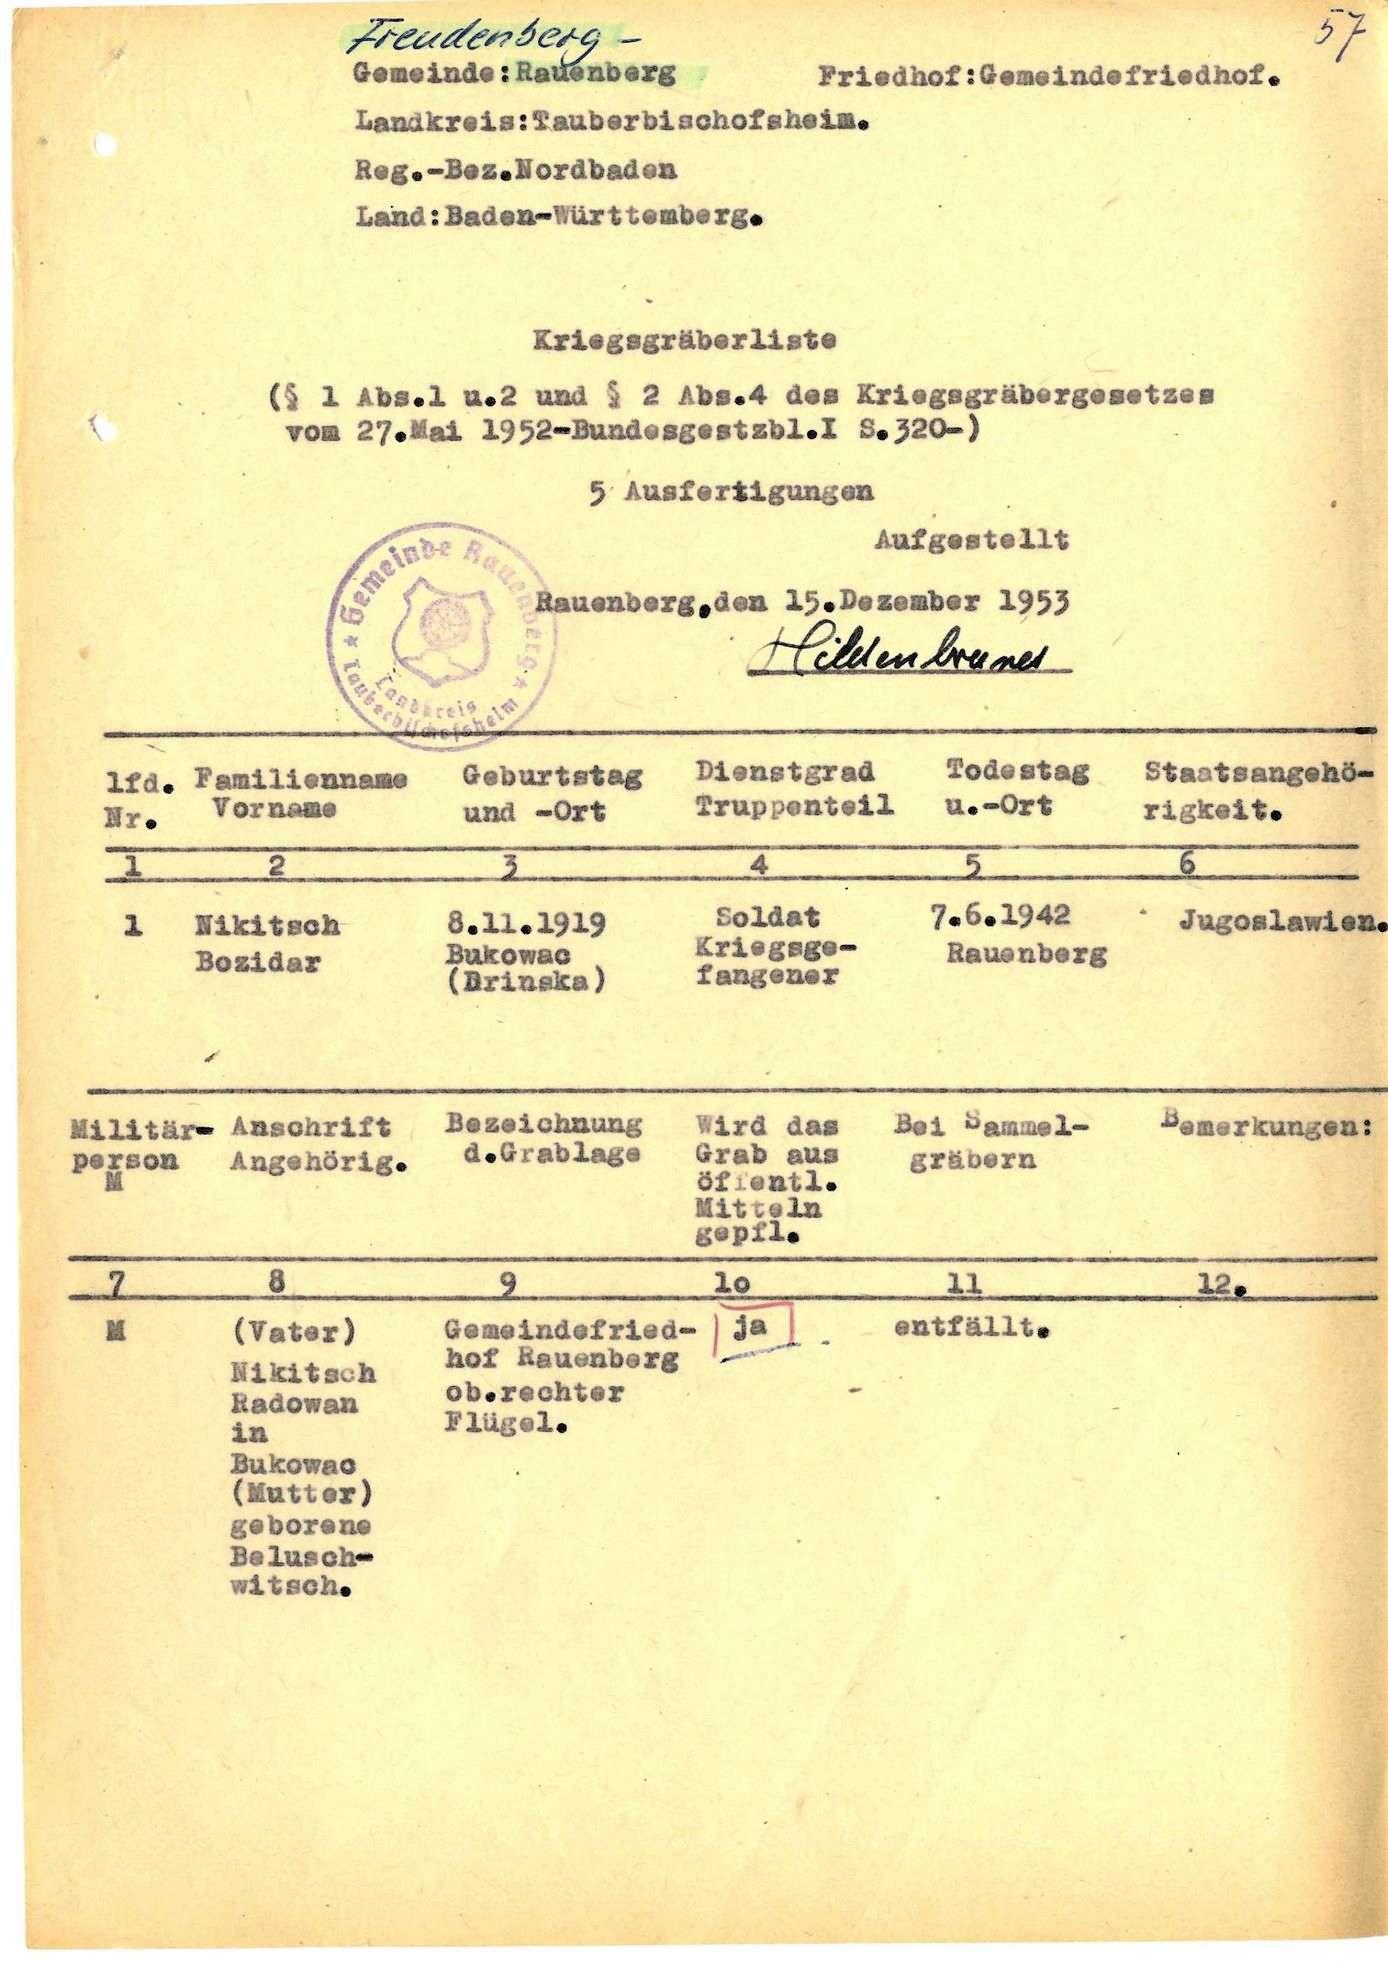 Rauenberg, Bild 1